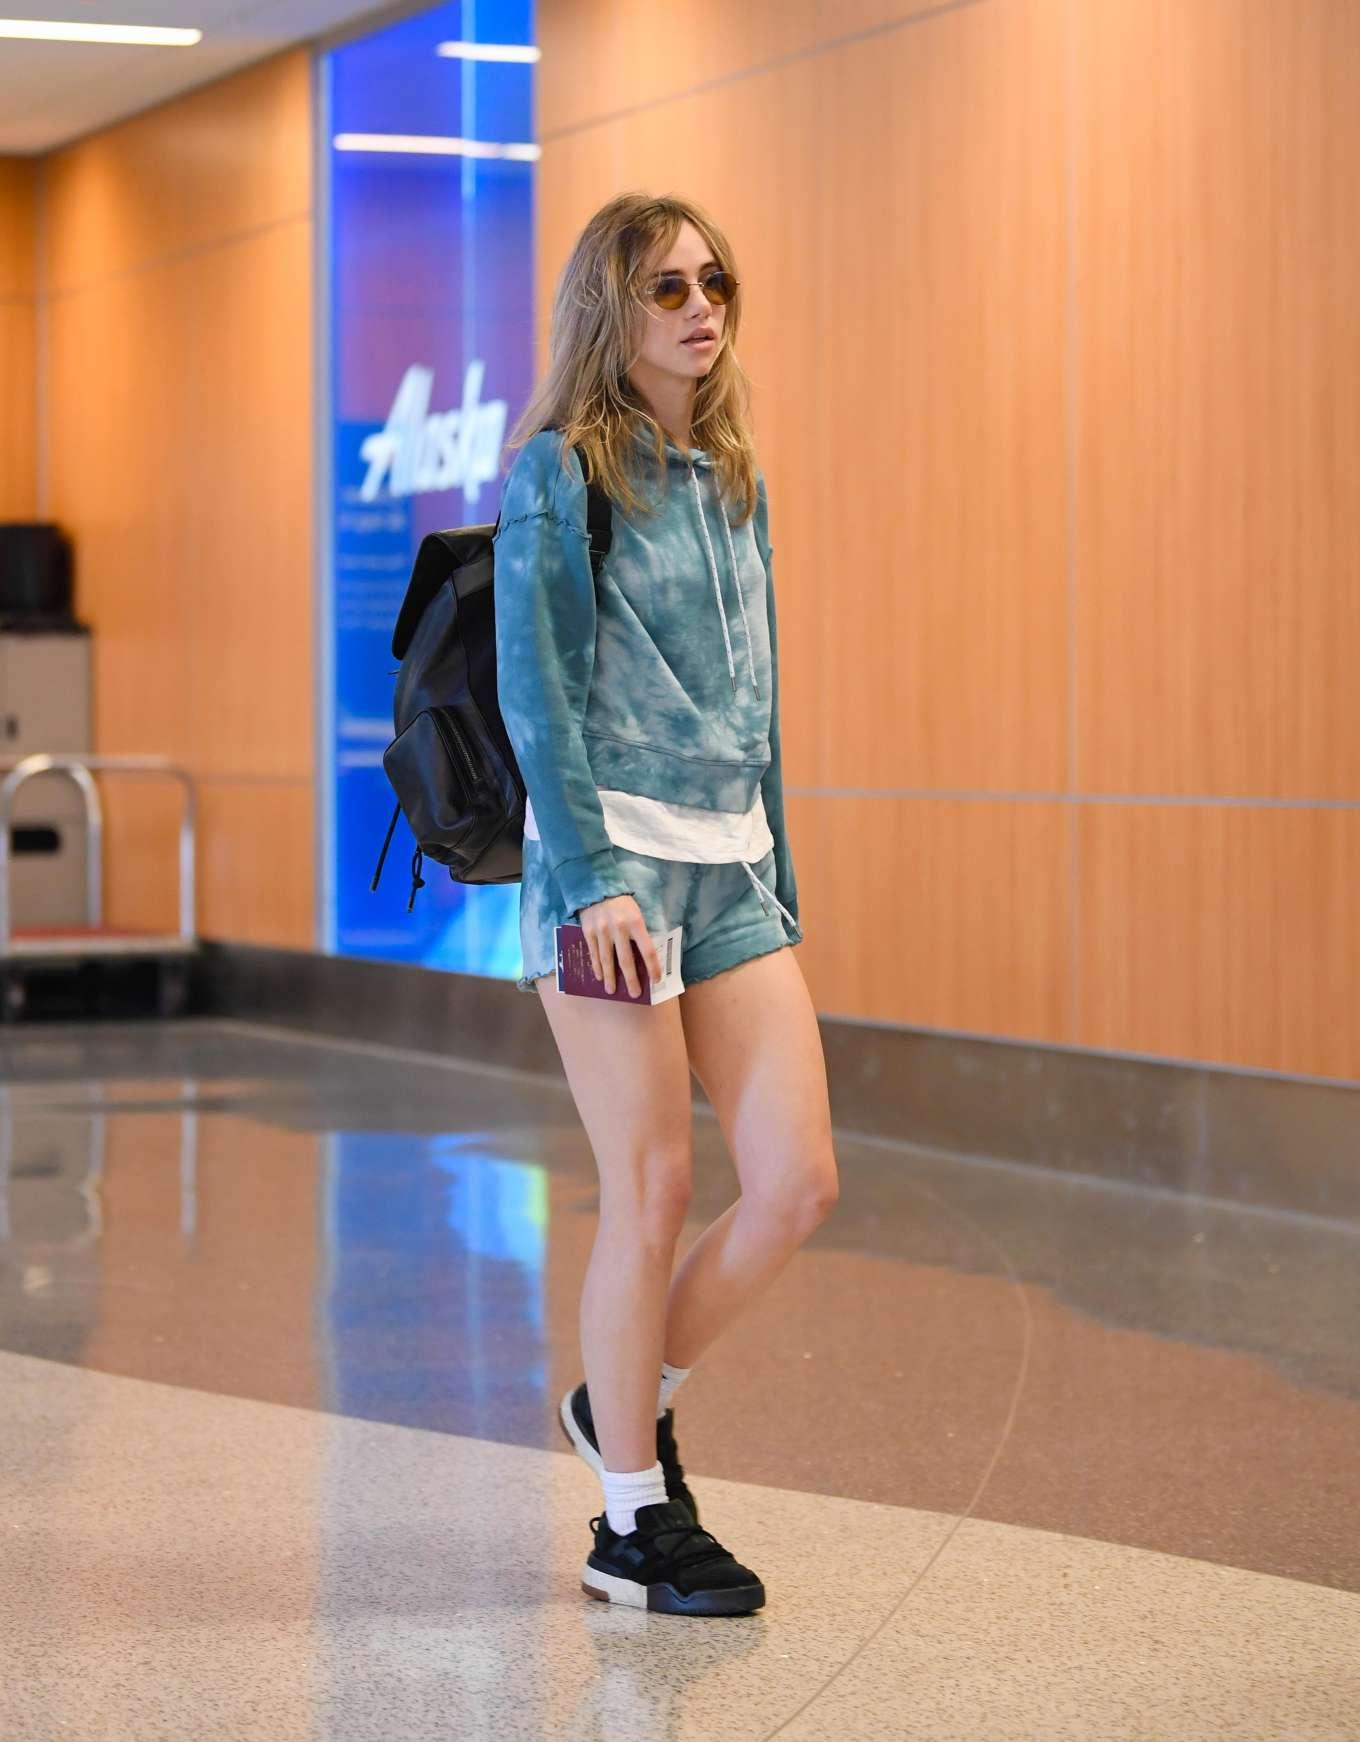 Suki Waterhouse 2019 : Suki Waterhouse in Denim Shorts: Arrives at LAX Airport-08